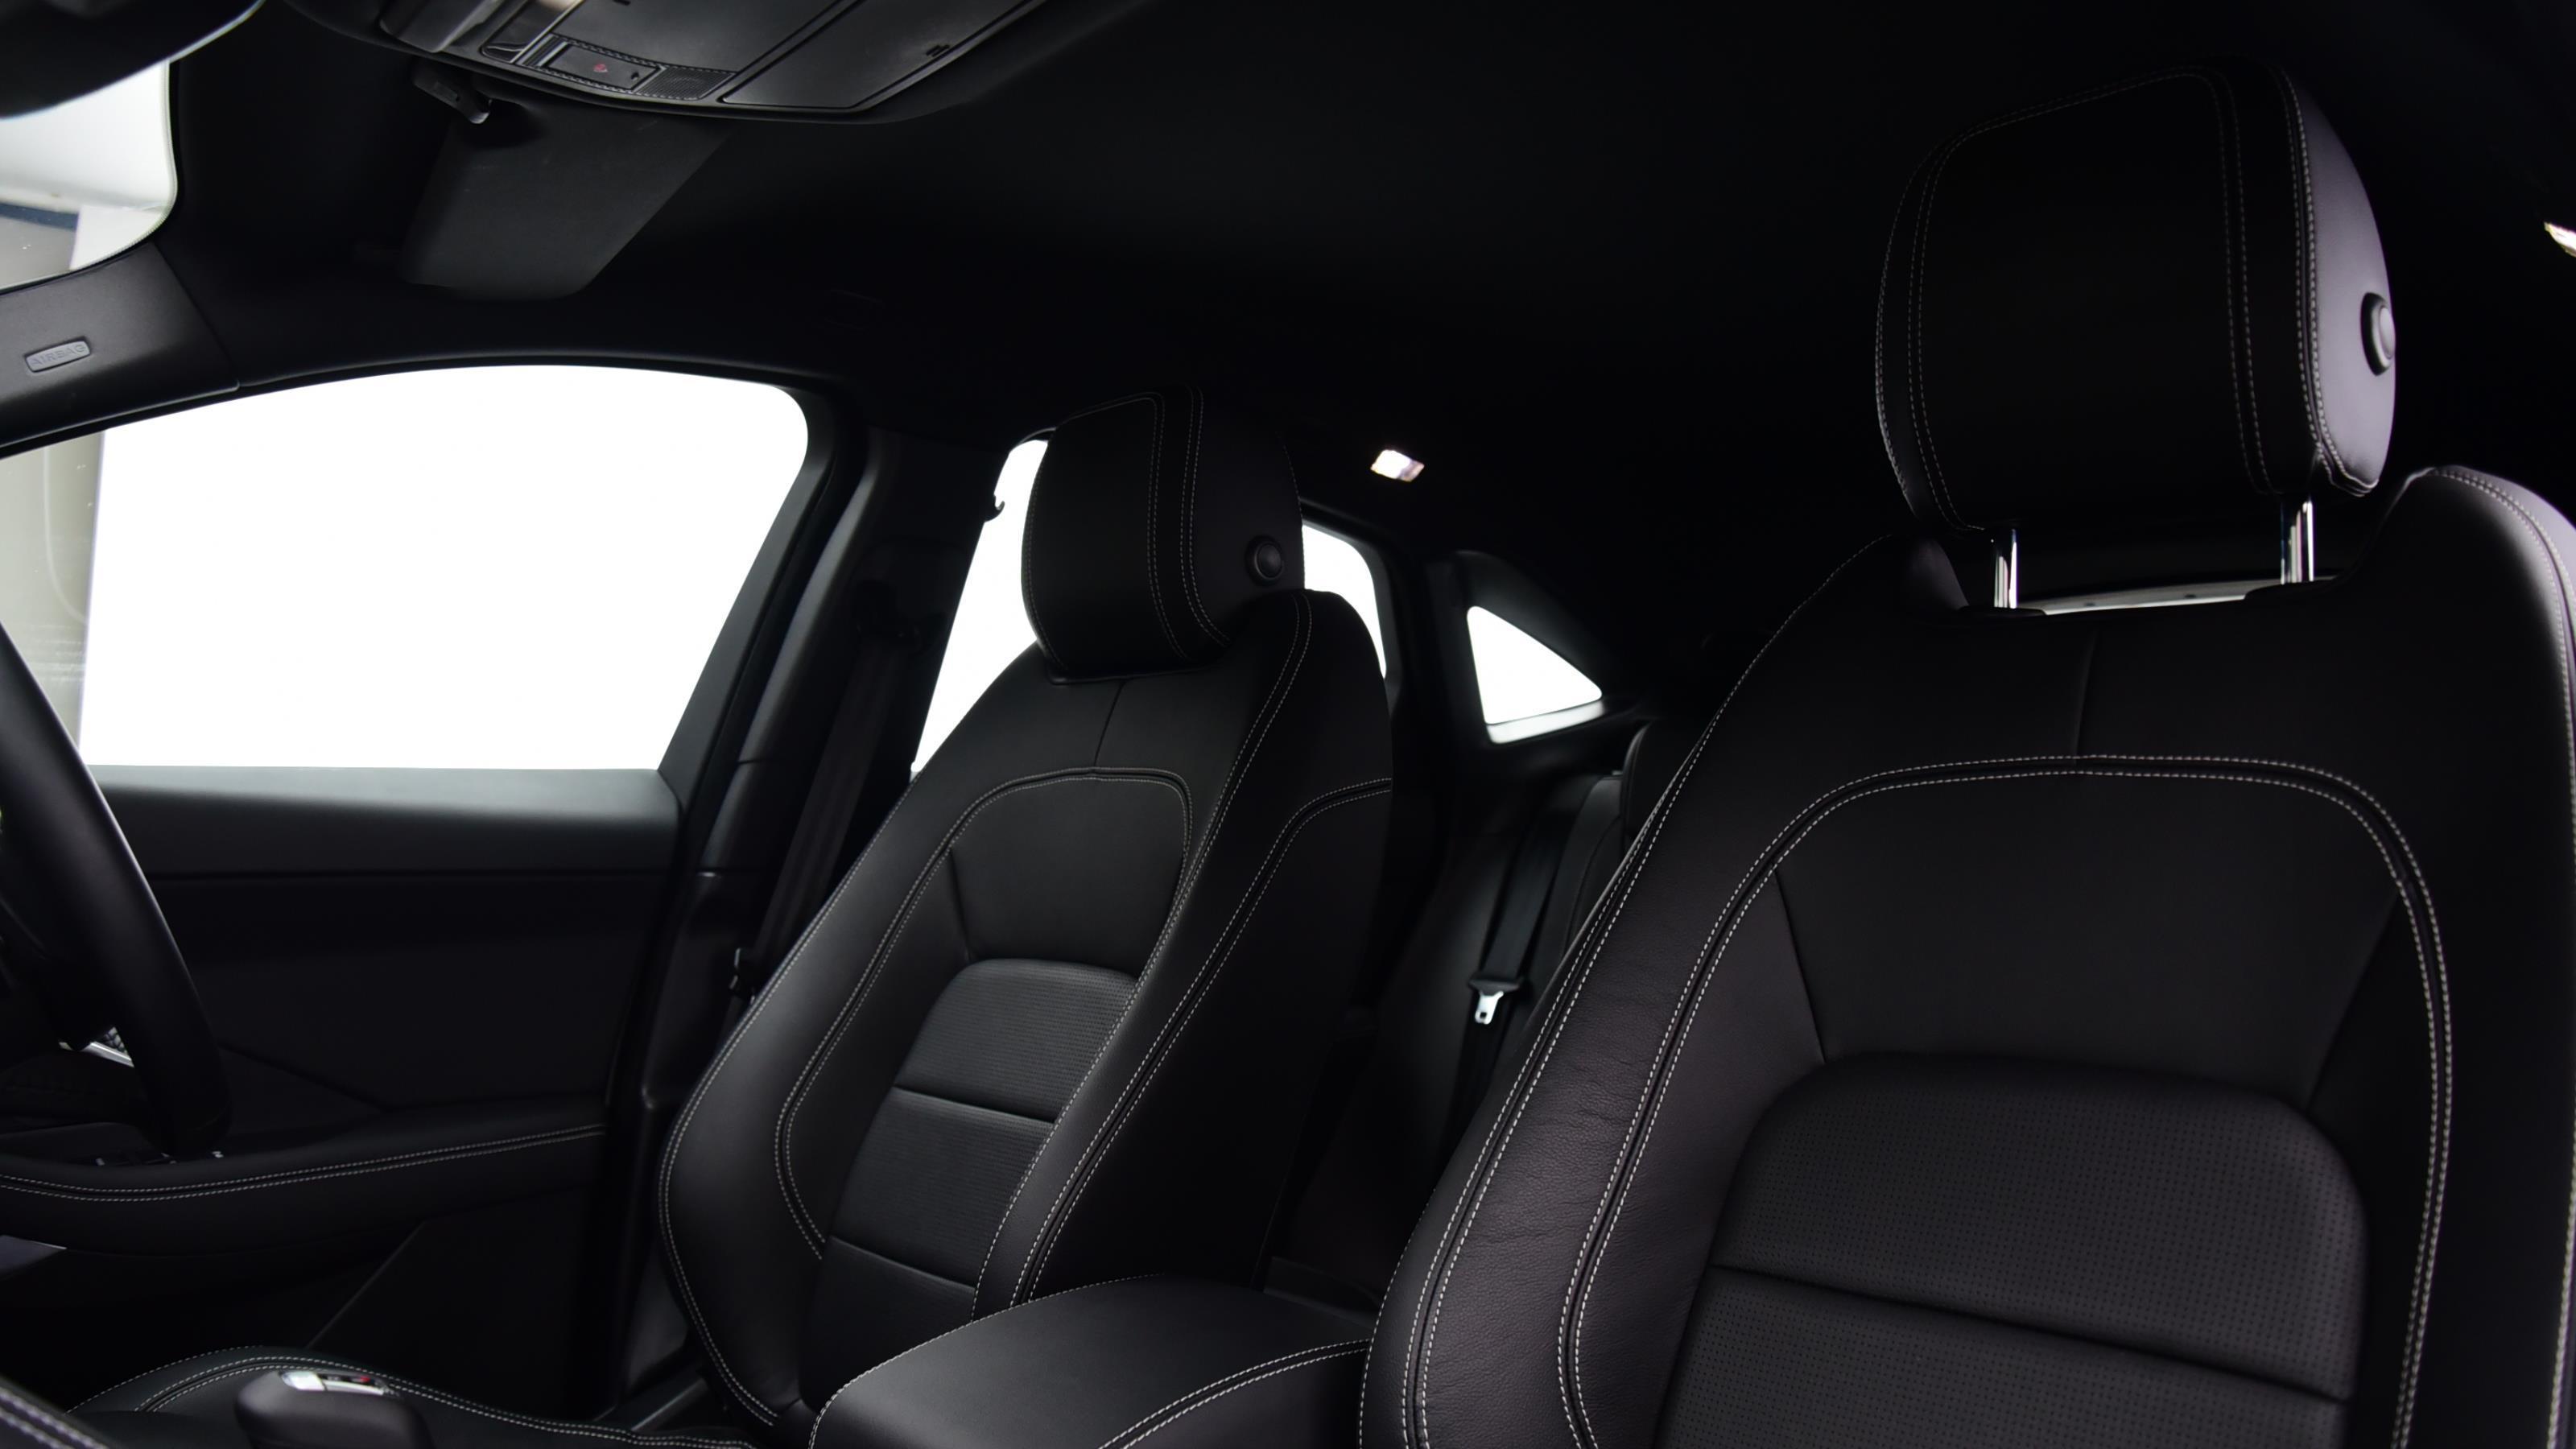 Used 2018 Jaguar E-PACE 2.0 R-Dynamic S 5dr Auto White at Saxton4x4